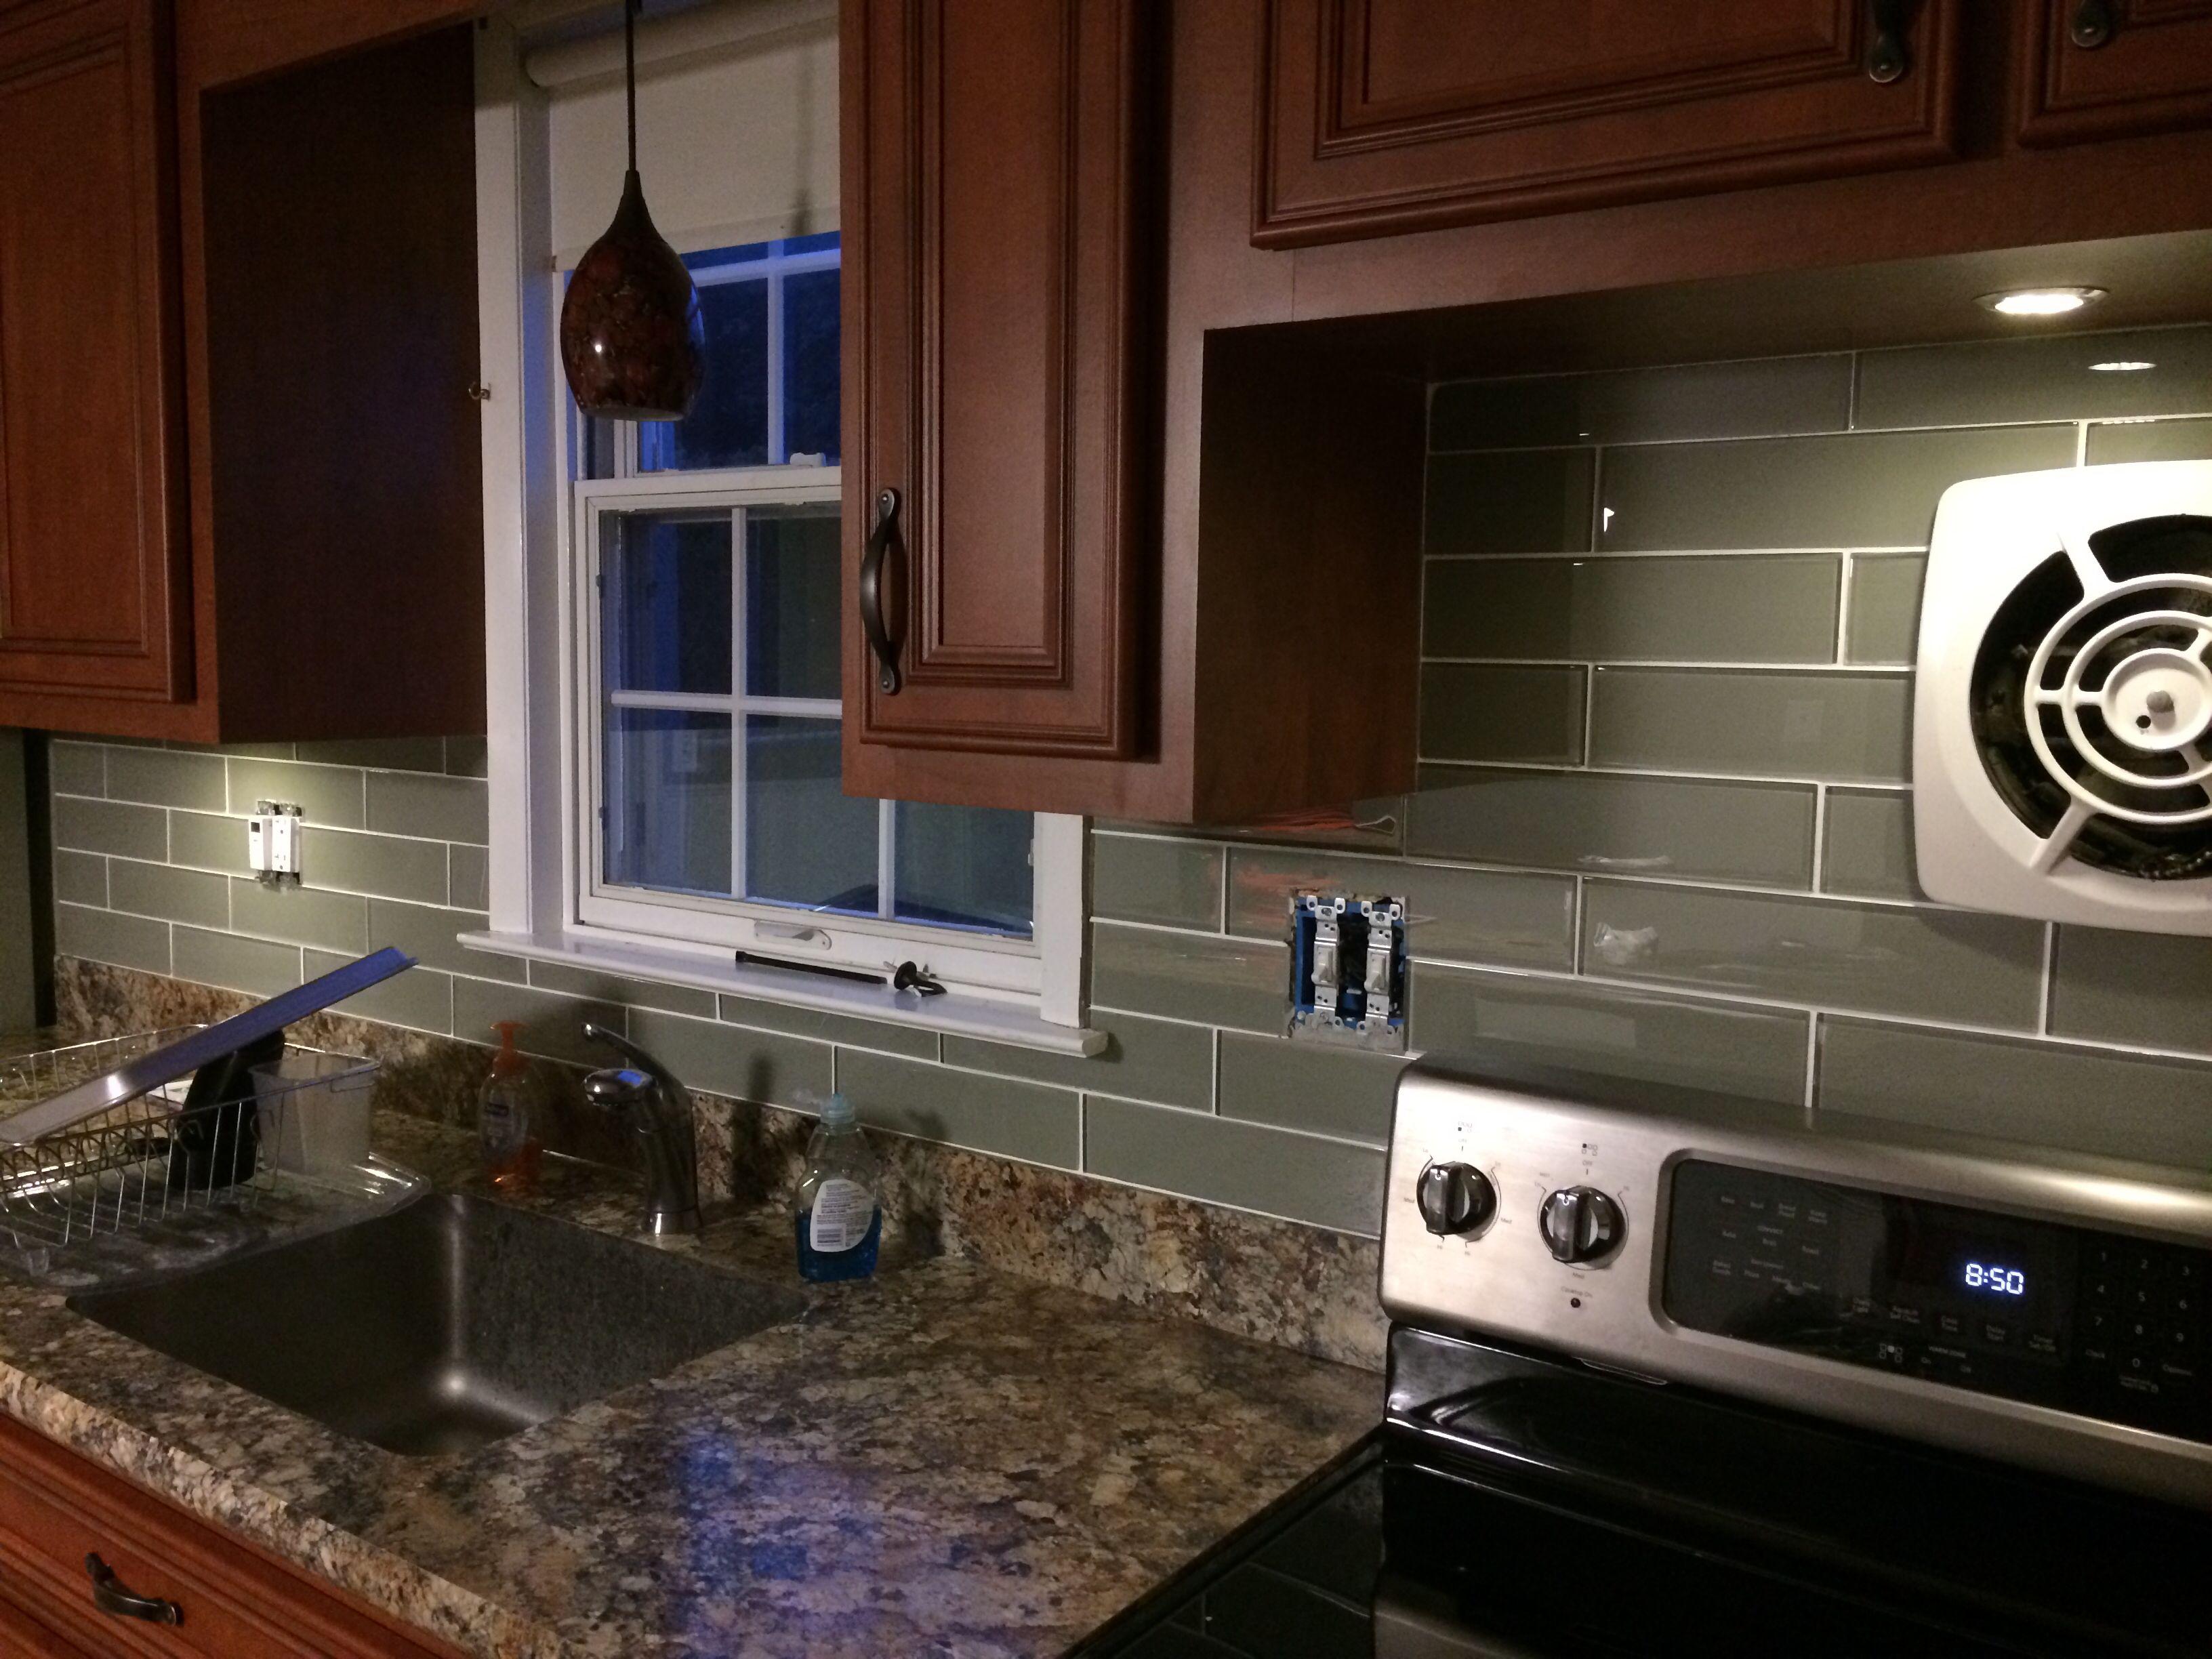 Grey Subway Tile Allen Roth Kitchen Remodel Kitchen Backsplash Kitchen Renovation